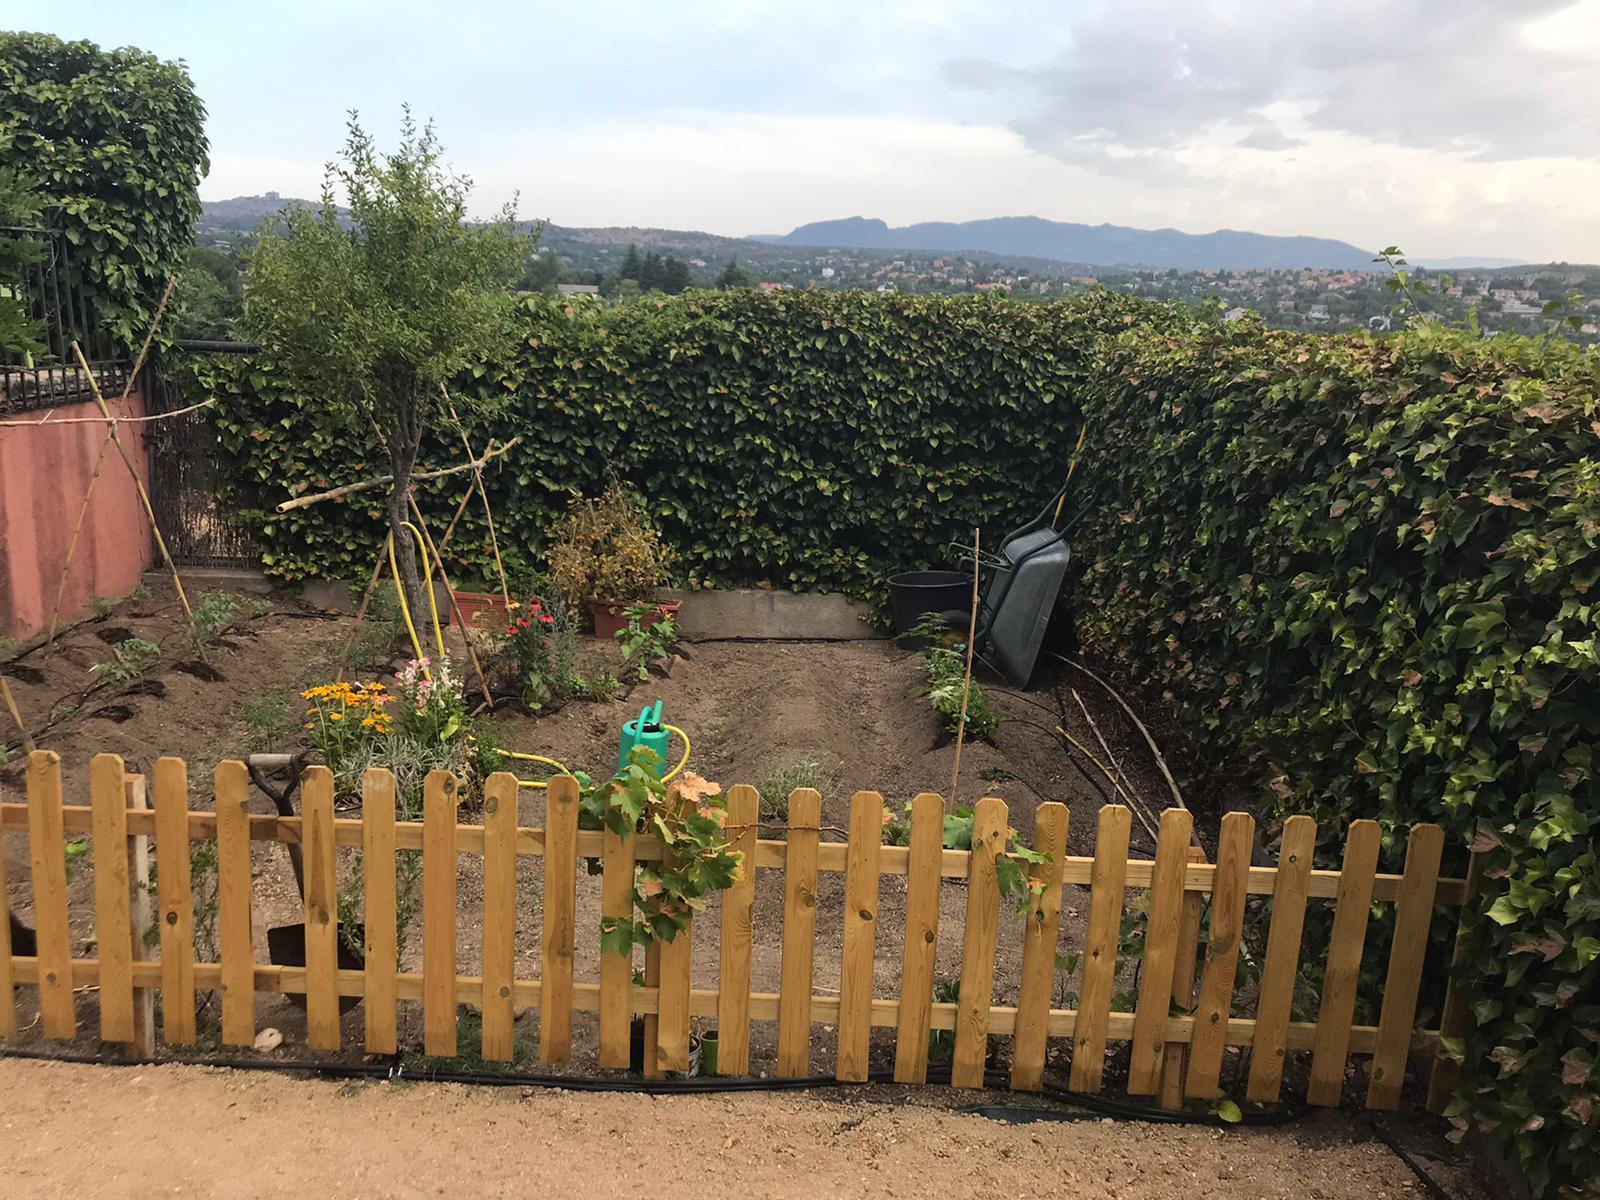 Huerta en jardín Las Matas Las Rozas Madrid